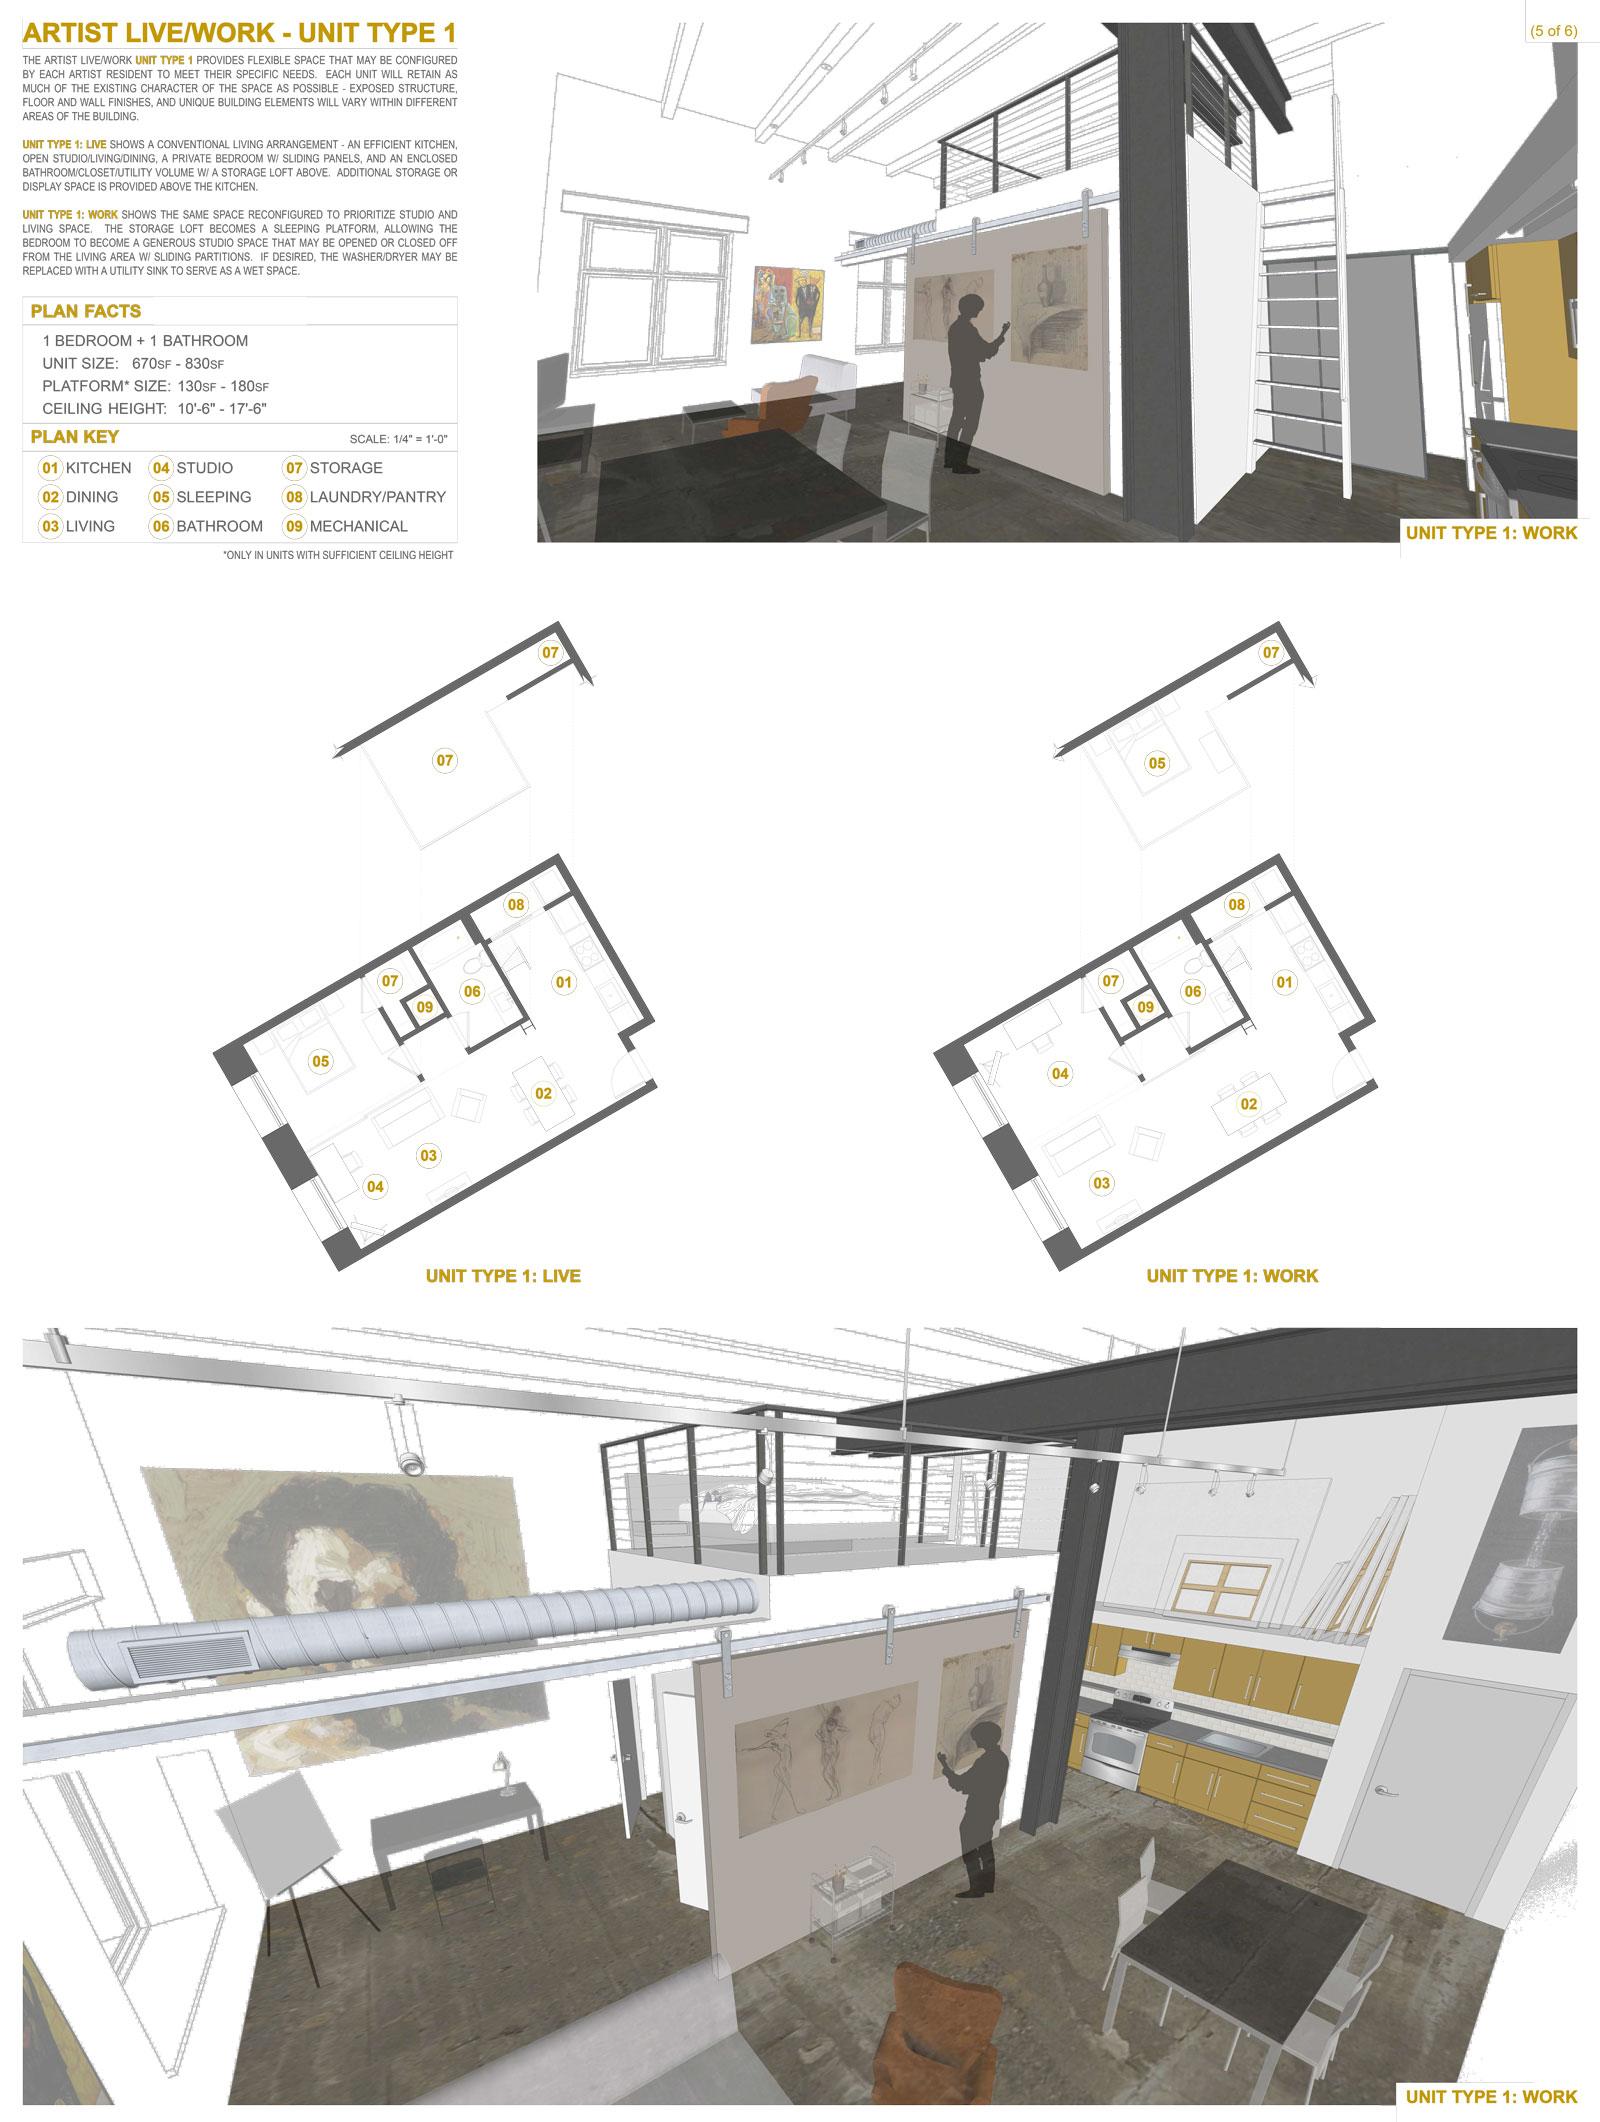 05-BREW-HOUSE---ARTIST-LIVE-WORK-UNIT-TYPE-1-reduced.jpg